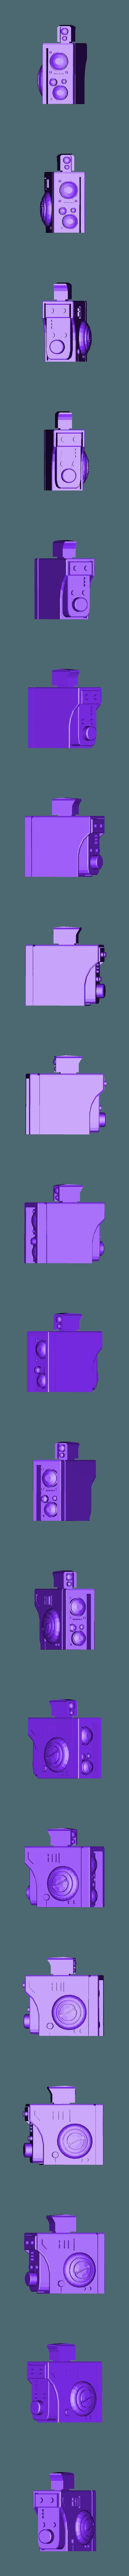 17Storm_Surge_Right_Arm_repaired.stl Download free OBJ file Tempest Rush Mech • 3D printer model, Leesedrenfort